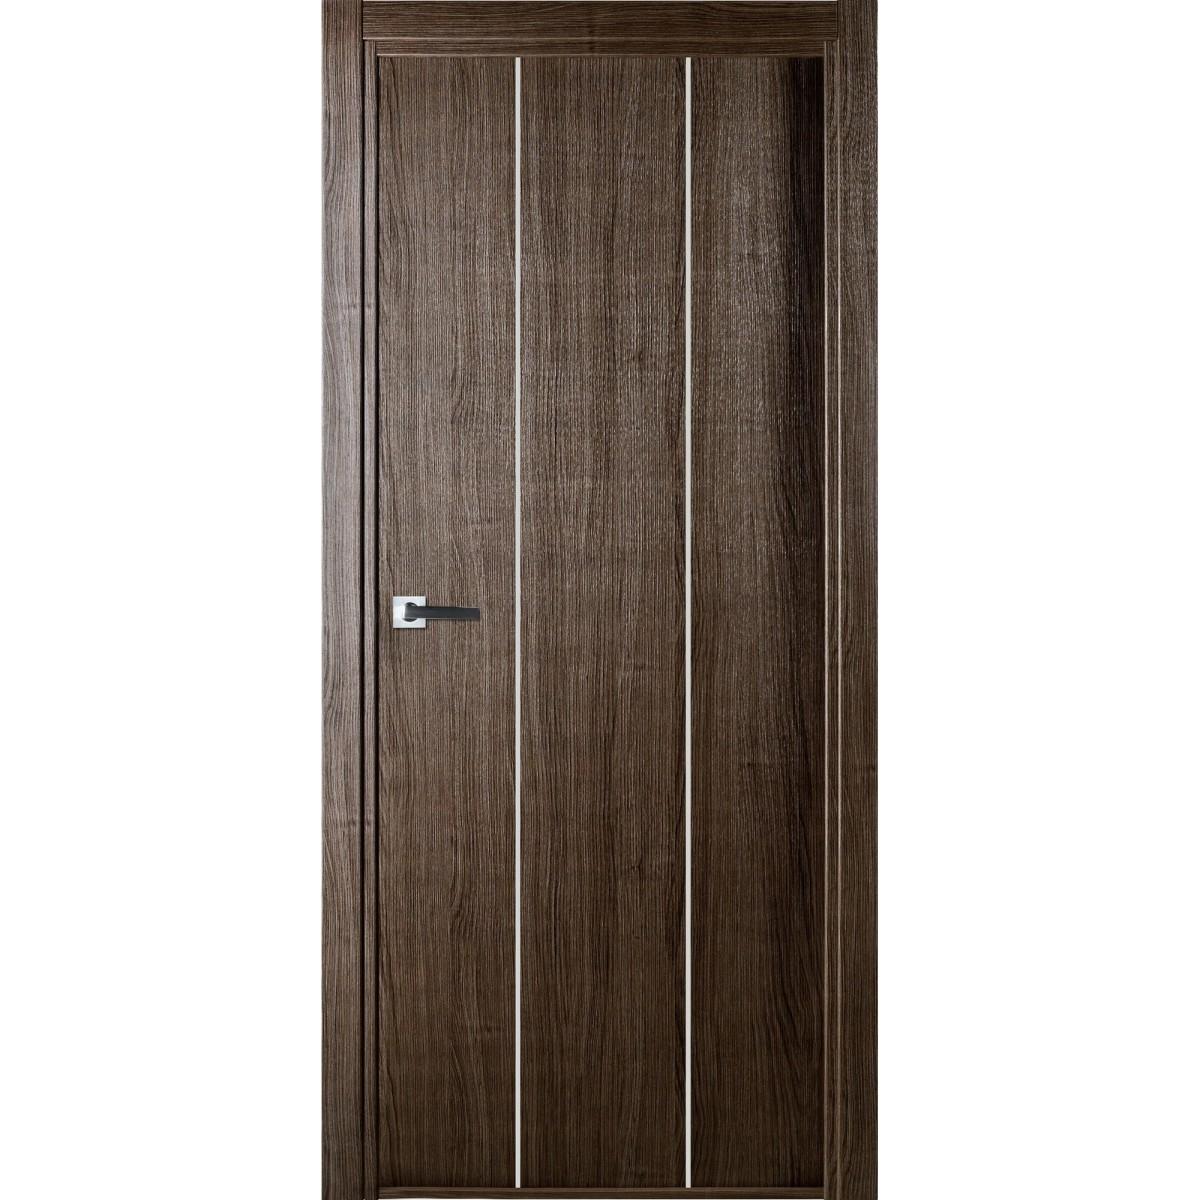 Дверь Межкомнатная Глухая Спэйс 60x200 Ламинация Цвет Серый Дуб С Фурнитурой